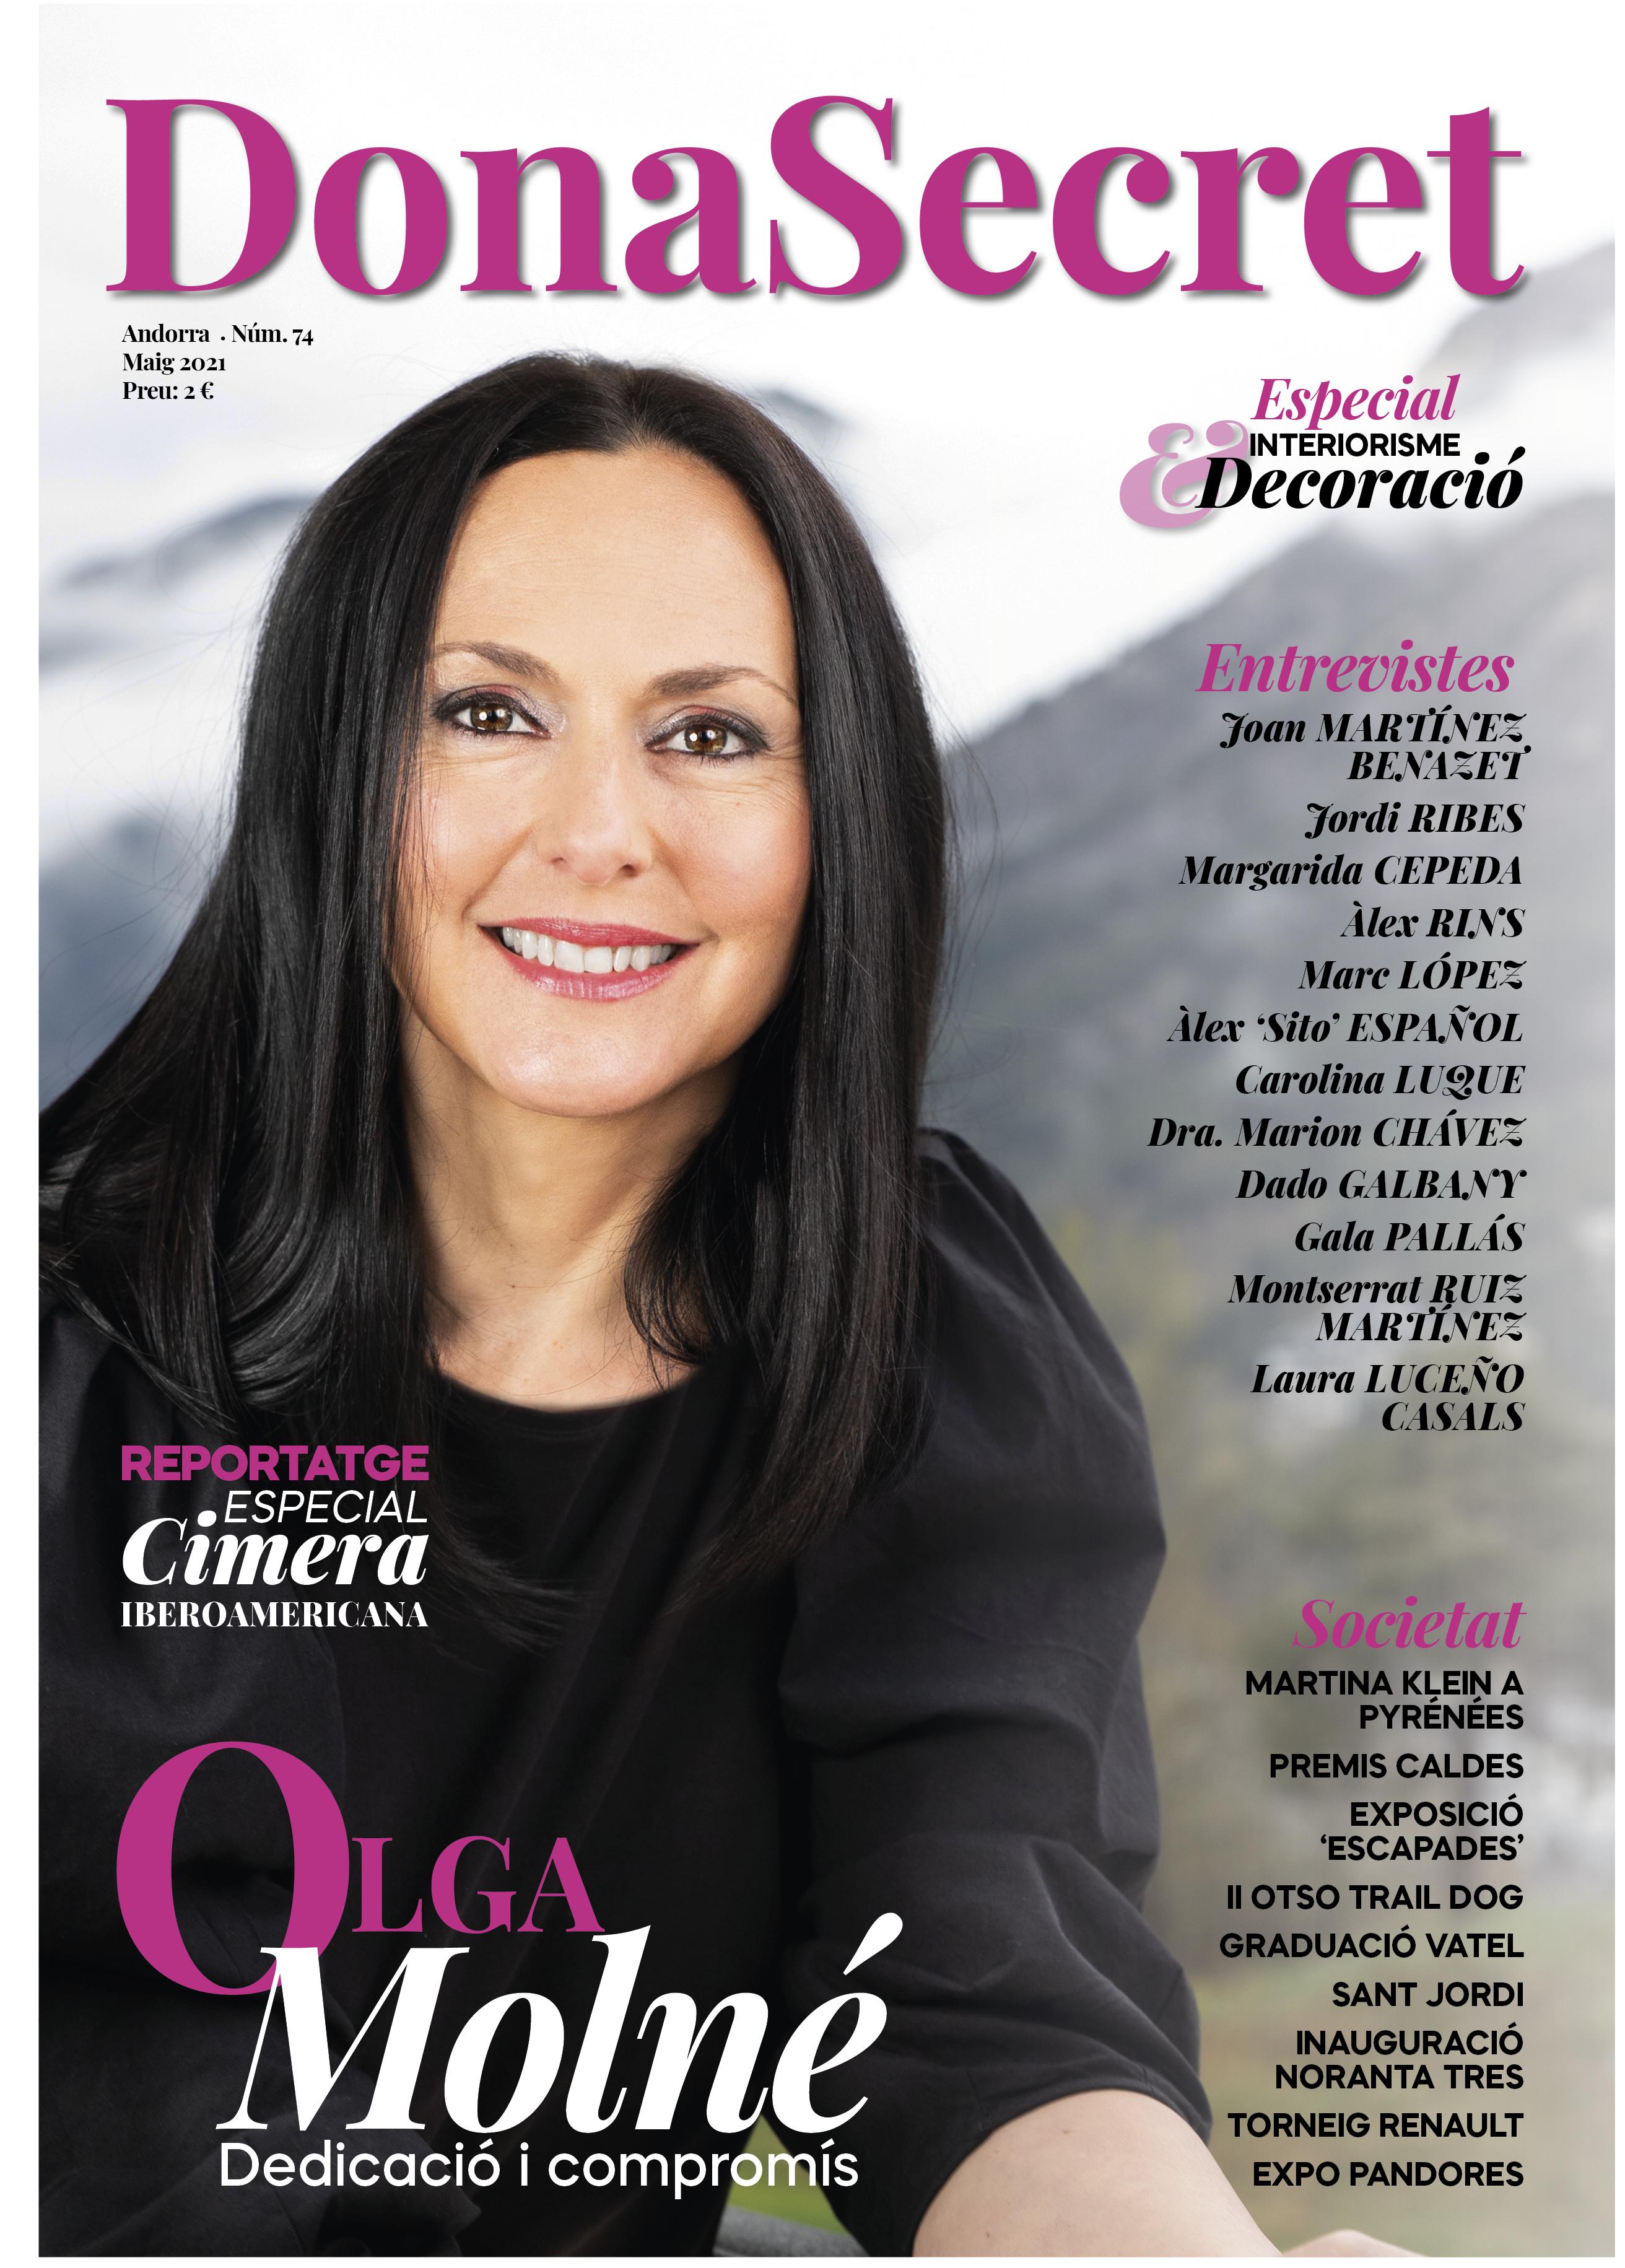 Revista Dona Secret 74 - Maig 2021 - Olga Molné